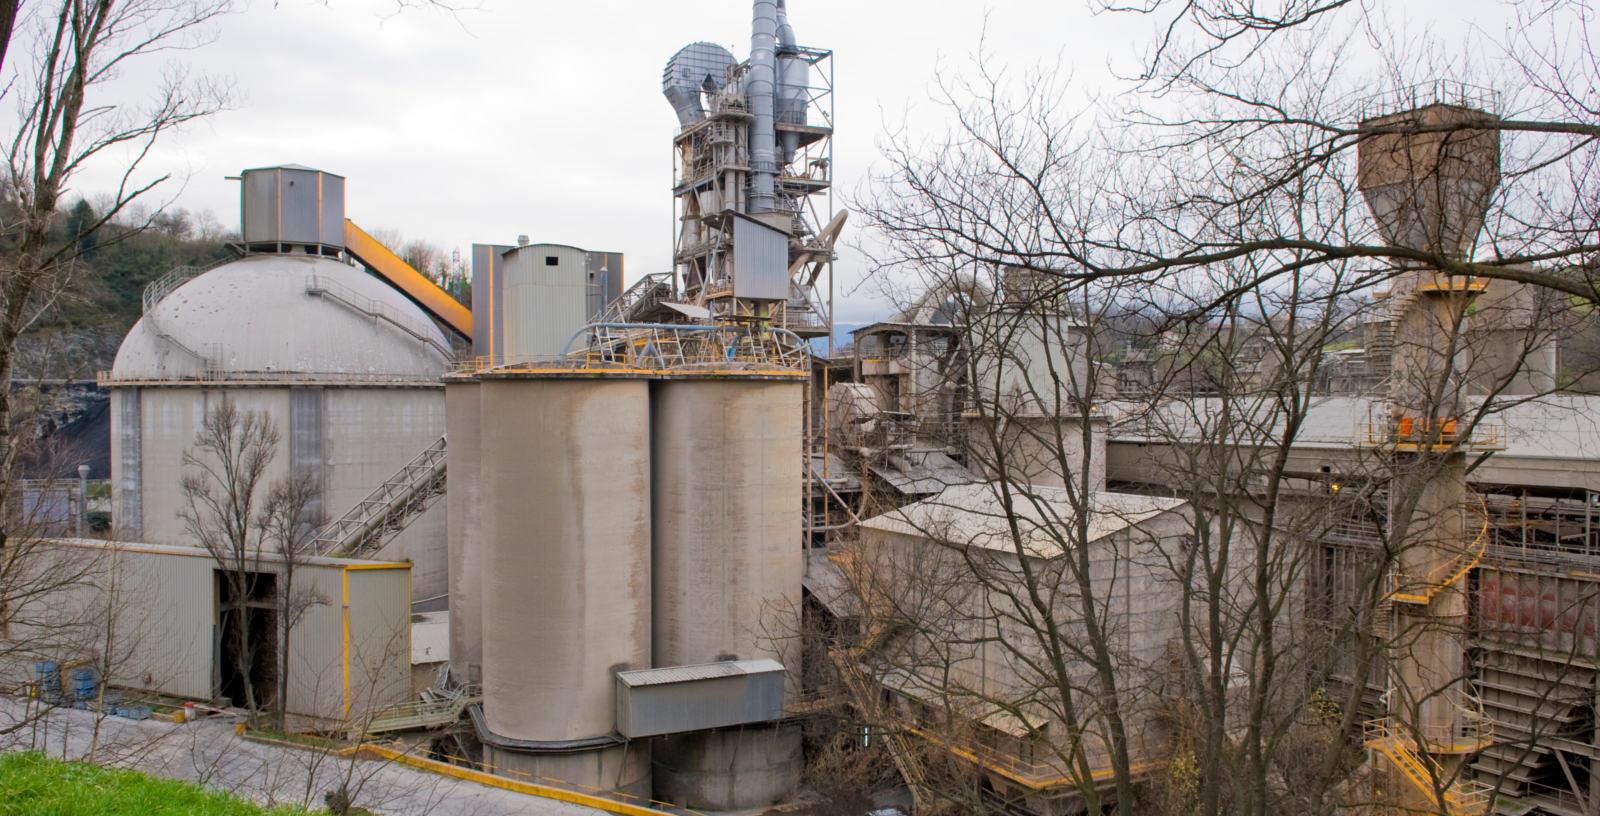 Cement_plant_HeidelbergCement_Rezola_Cementos_IDOM_01